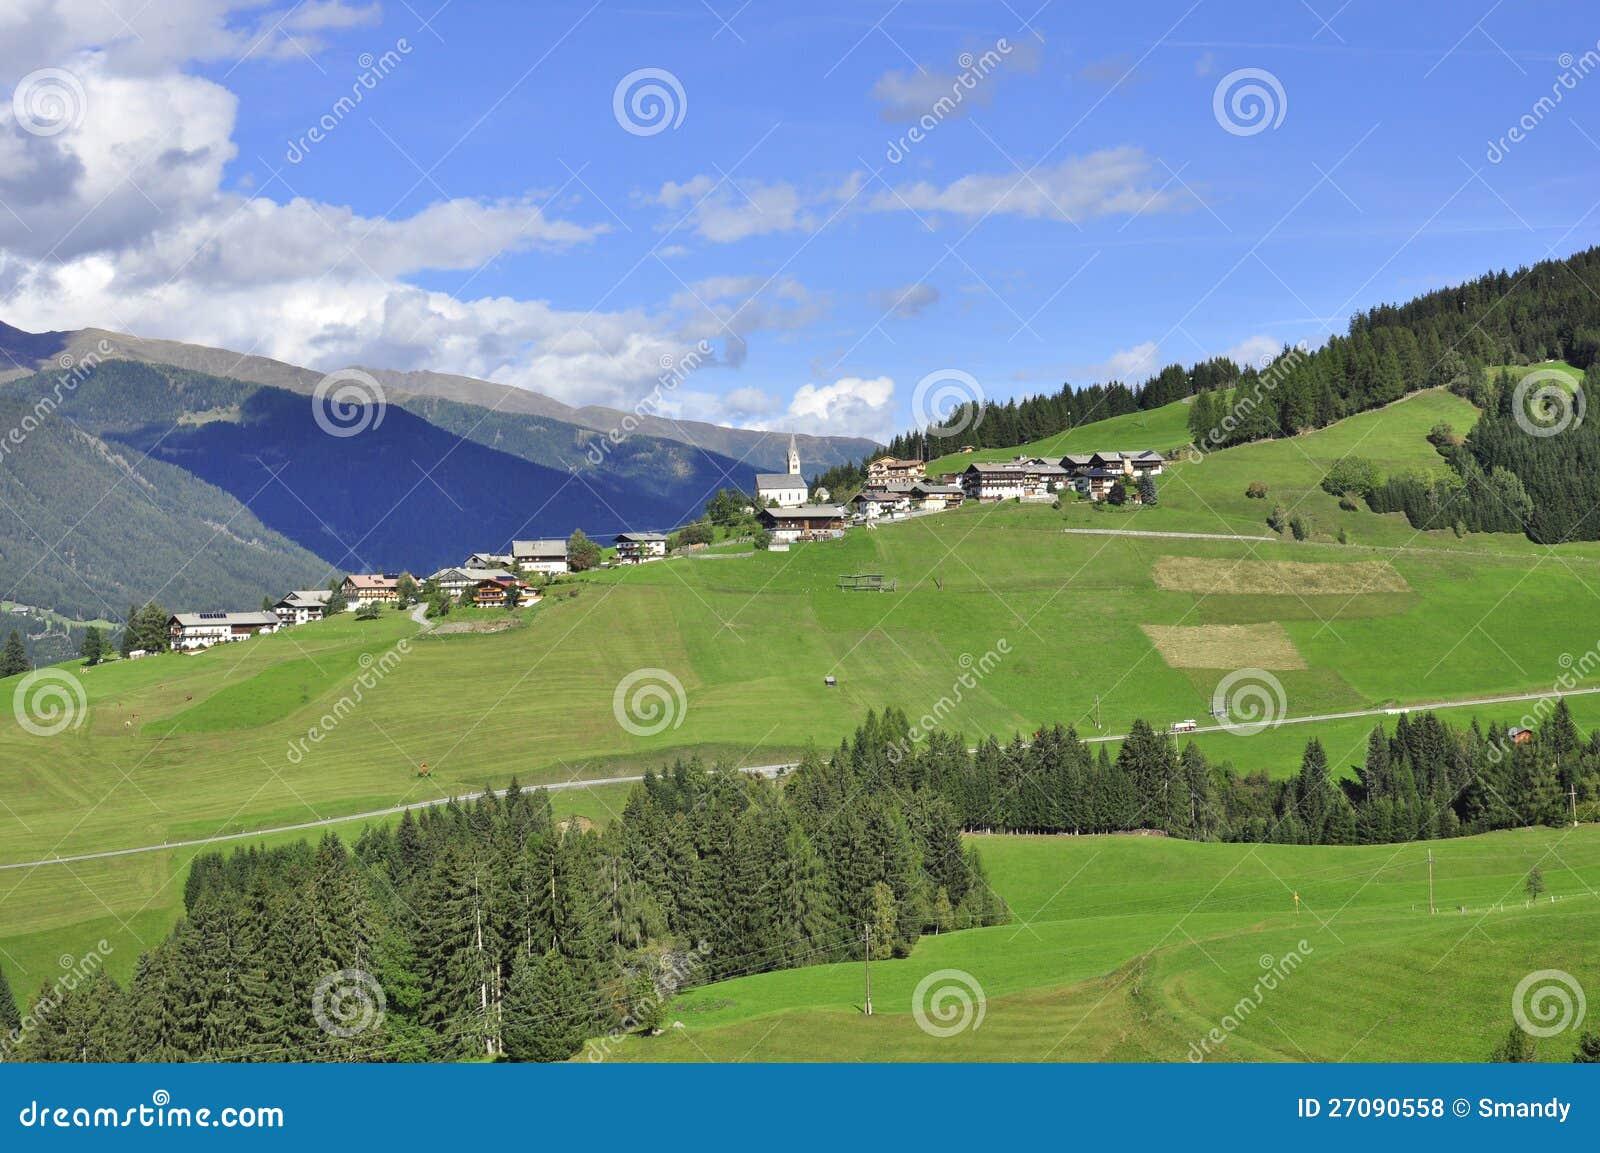 Typical Austrian Village In Tirol, Landscape Royalty Free